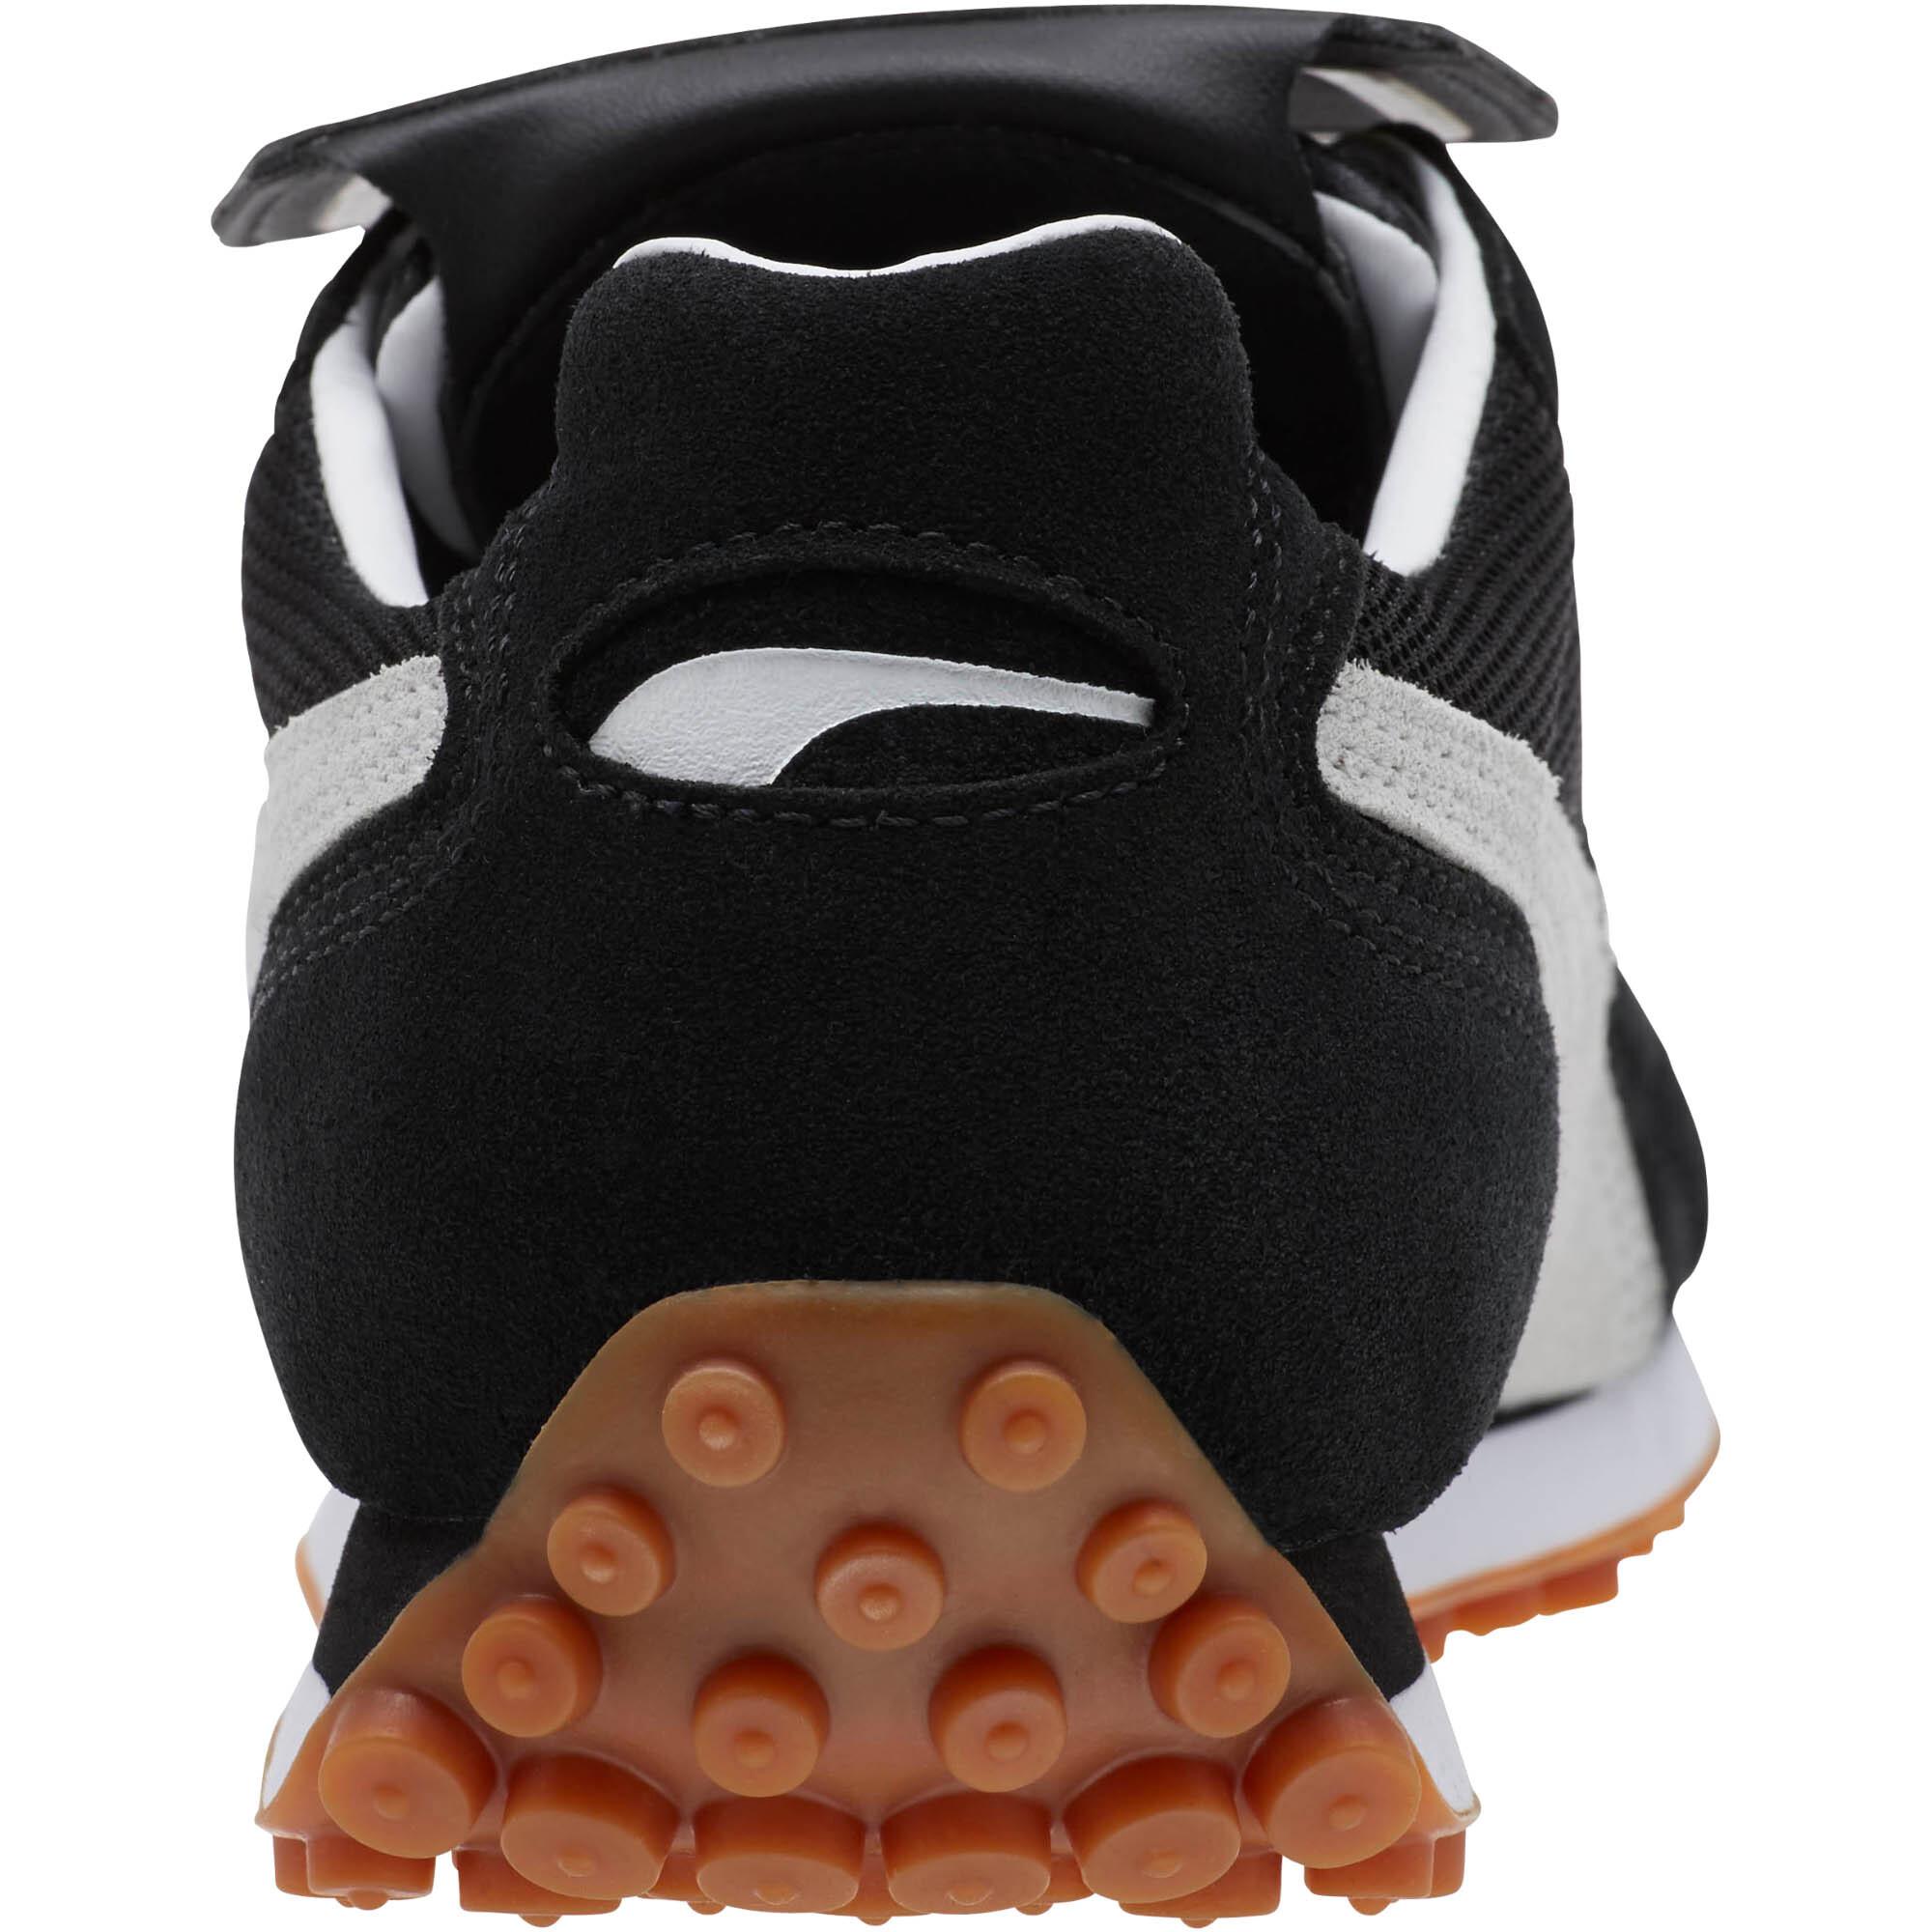 PUMA-King-Avanti-Soccer-Cleats-Unisex-Shoe-Sport-Classics thumbnail 3